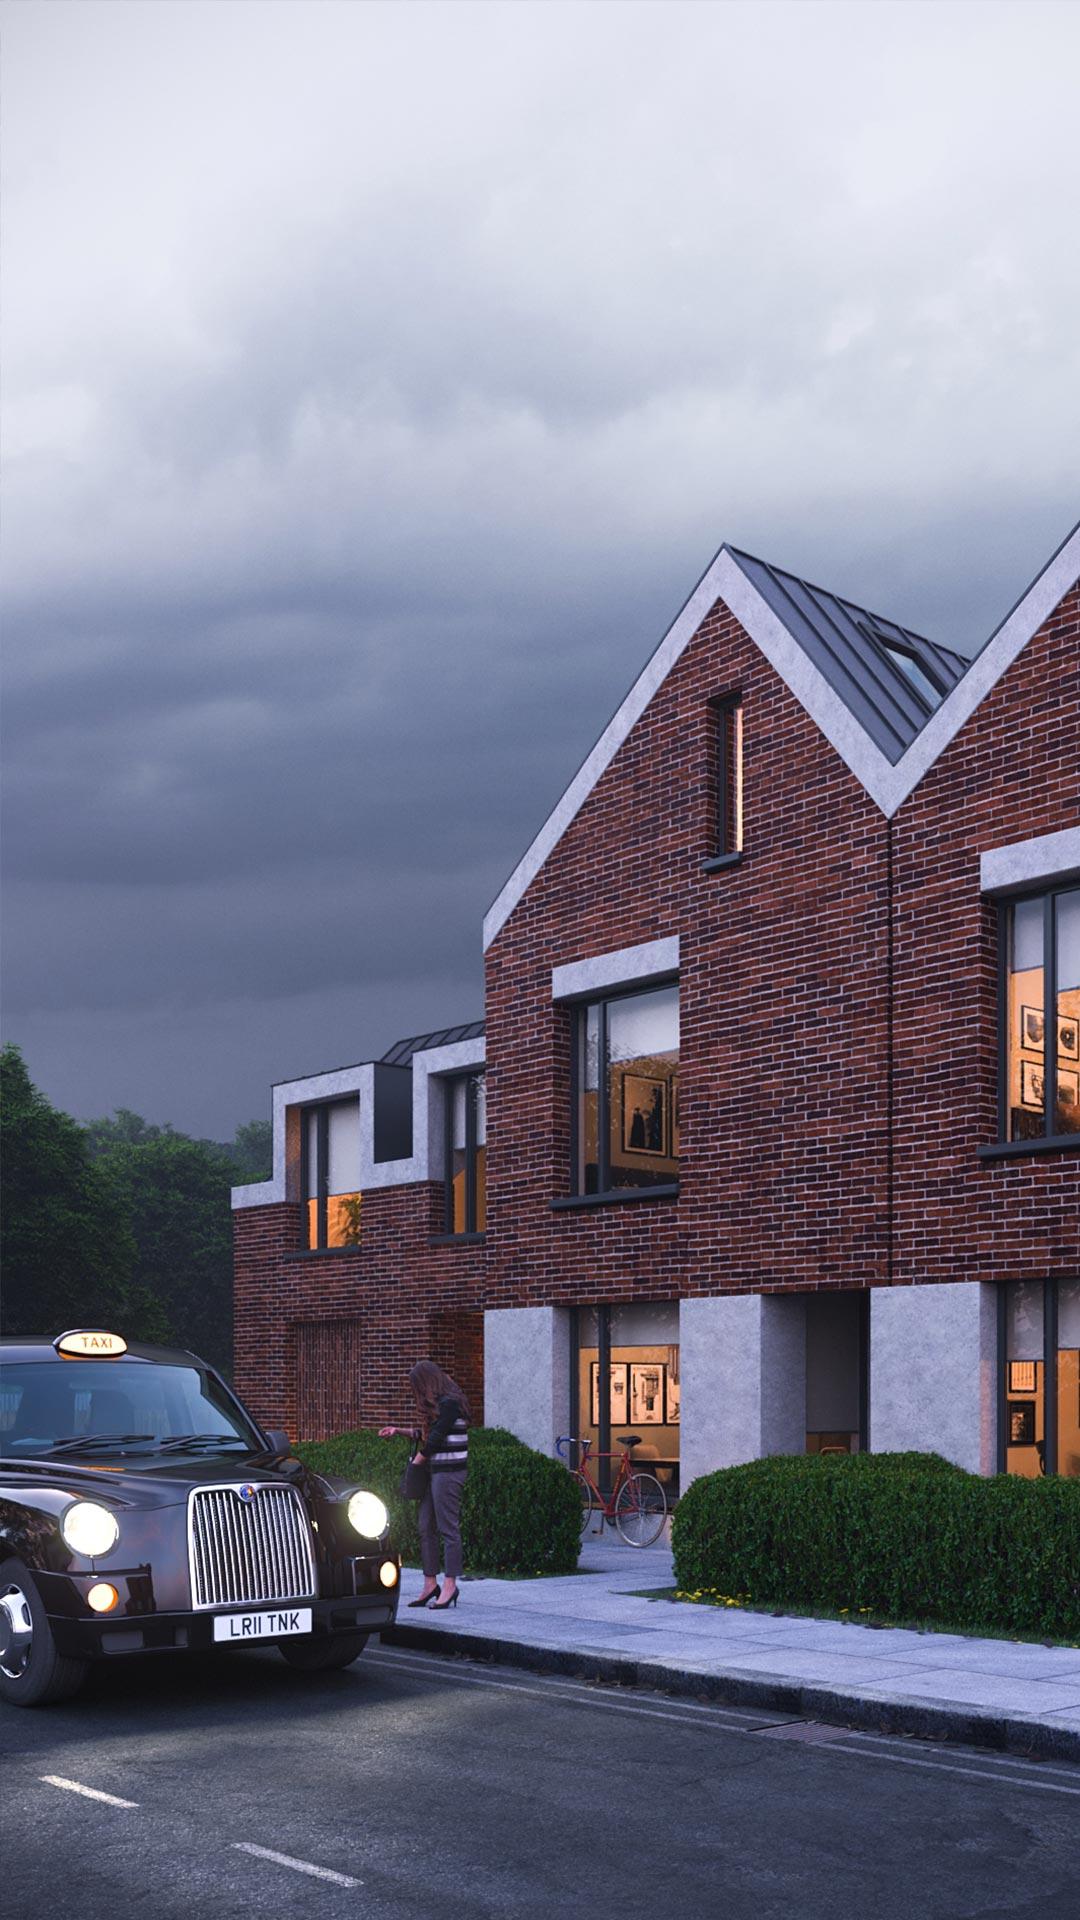 Smart Homes South London Camera 1 24 01 2020 1080X1920